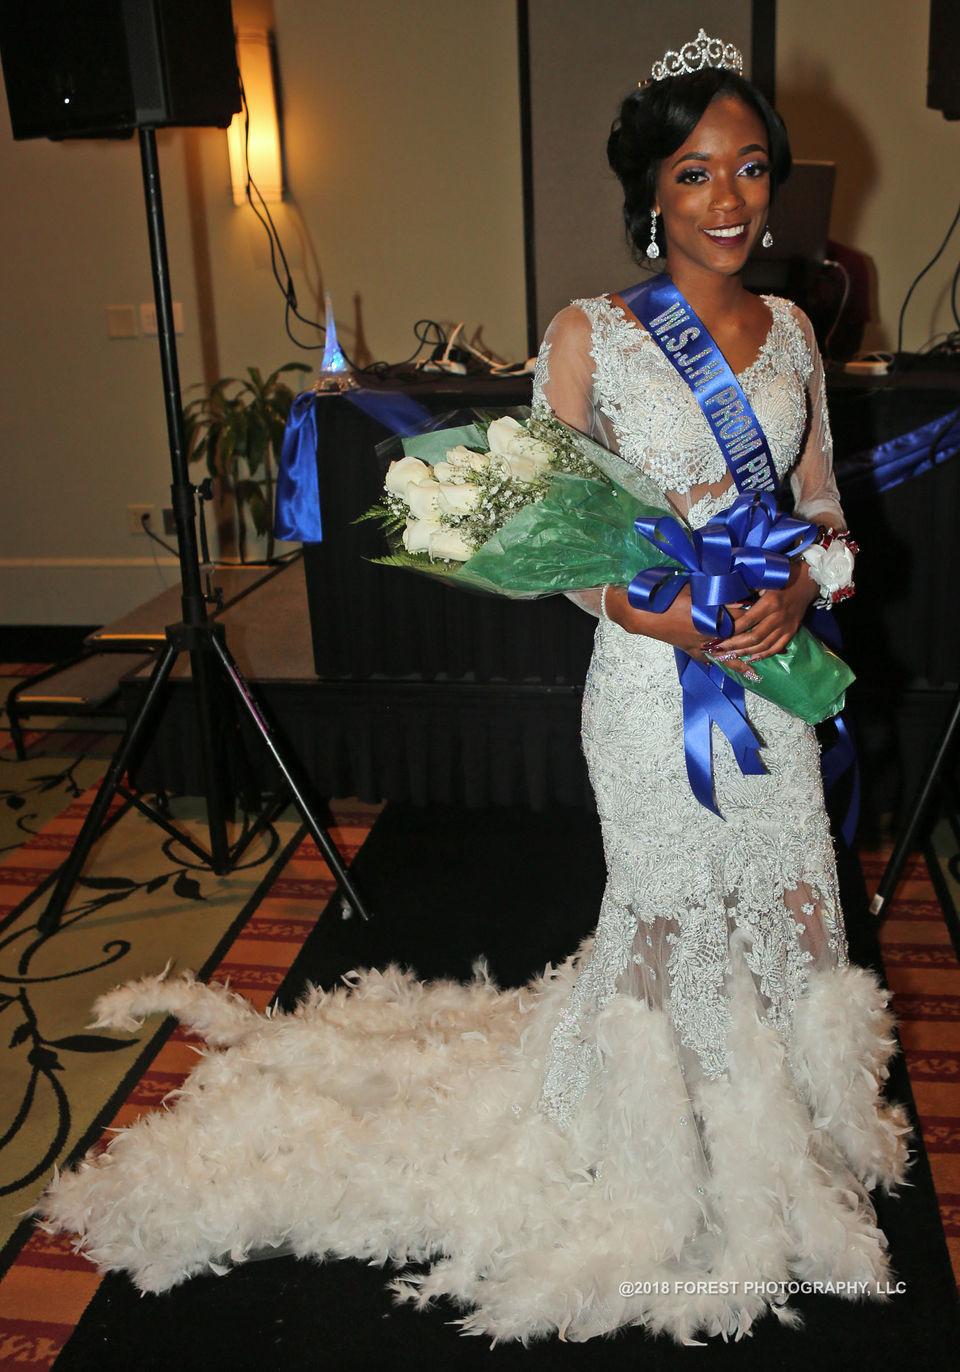 Prom 2018: West St. John High School dances to 'Grande Paris'